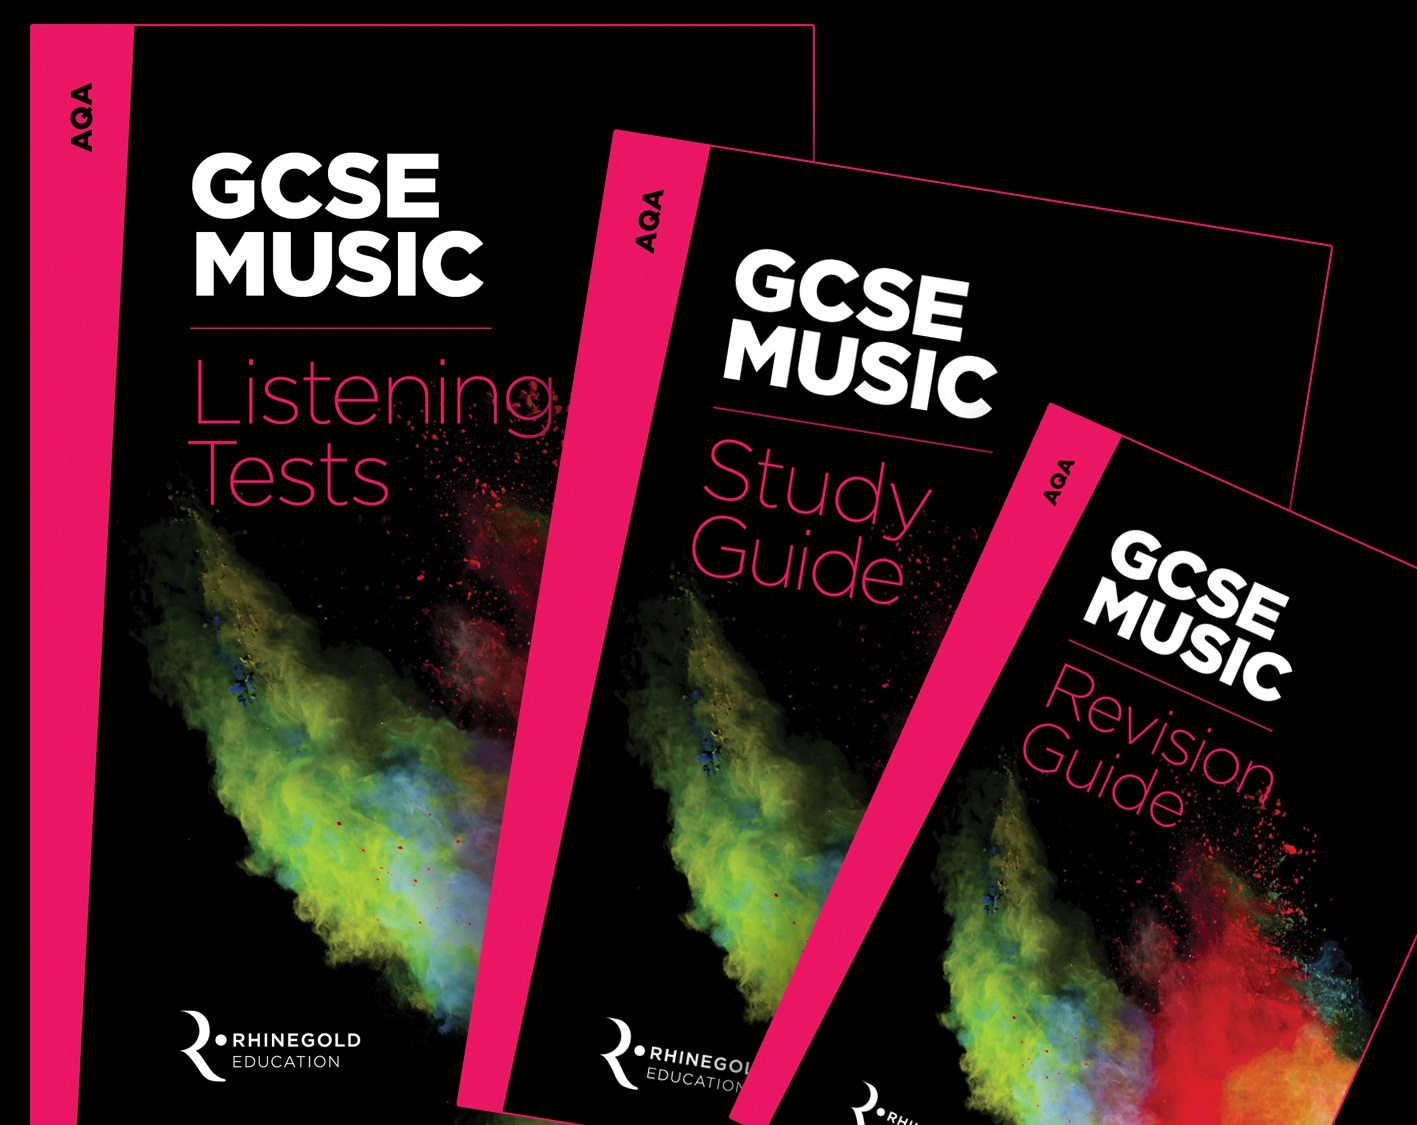 AQA GCSE Music Exam Pack: Reference